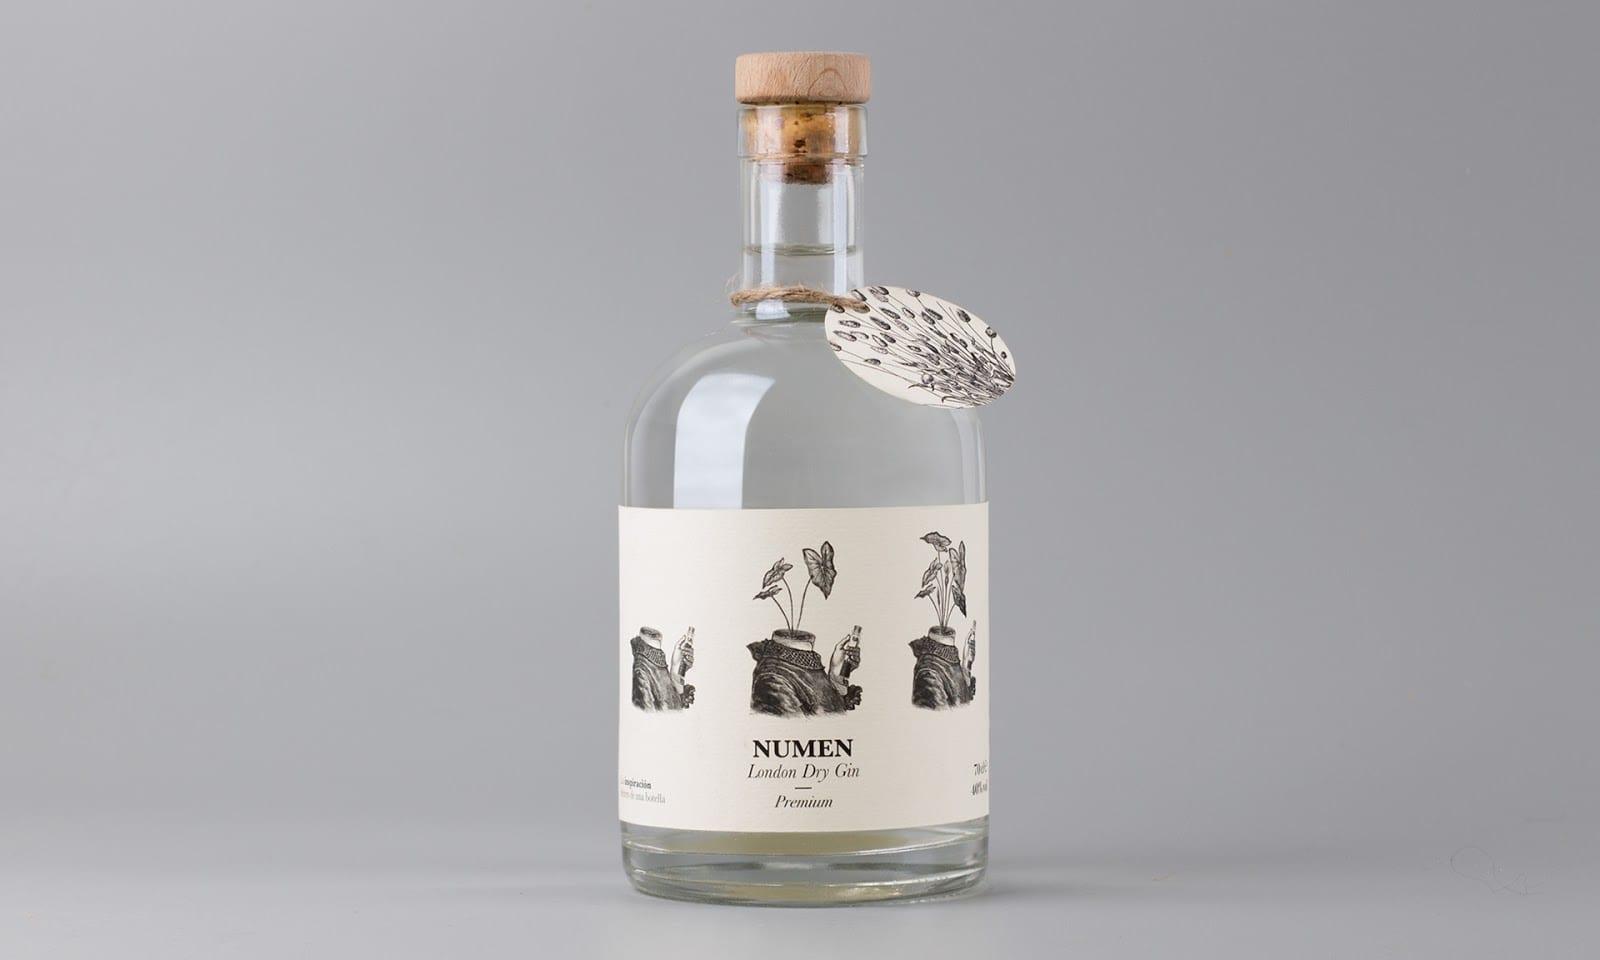 Numen Dry Gin 01 - Ach, tie obaly – Numen Dry Gin